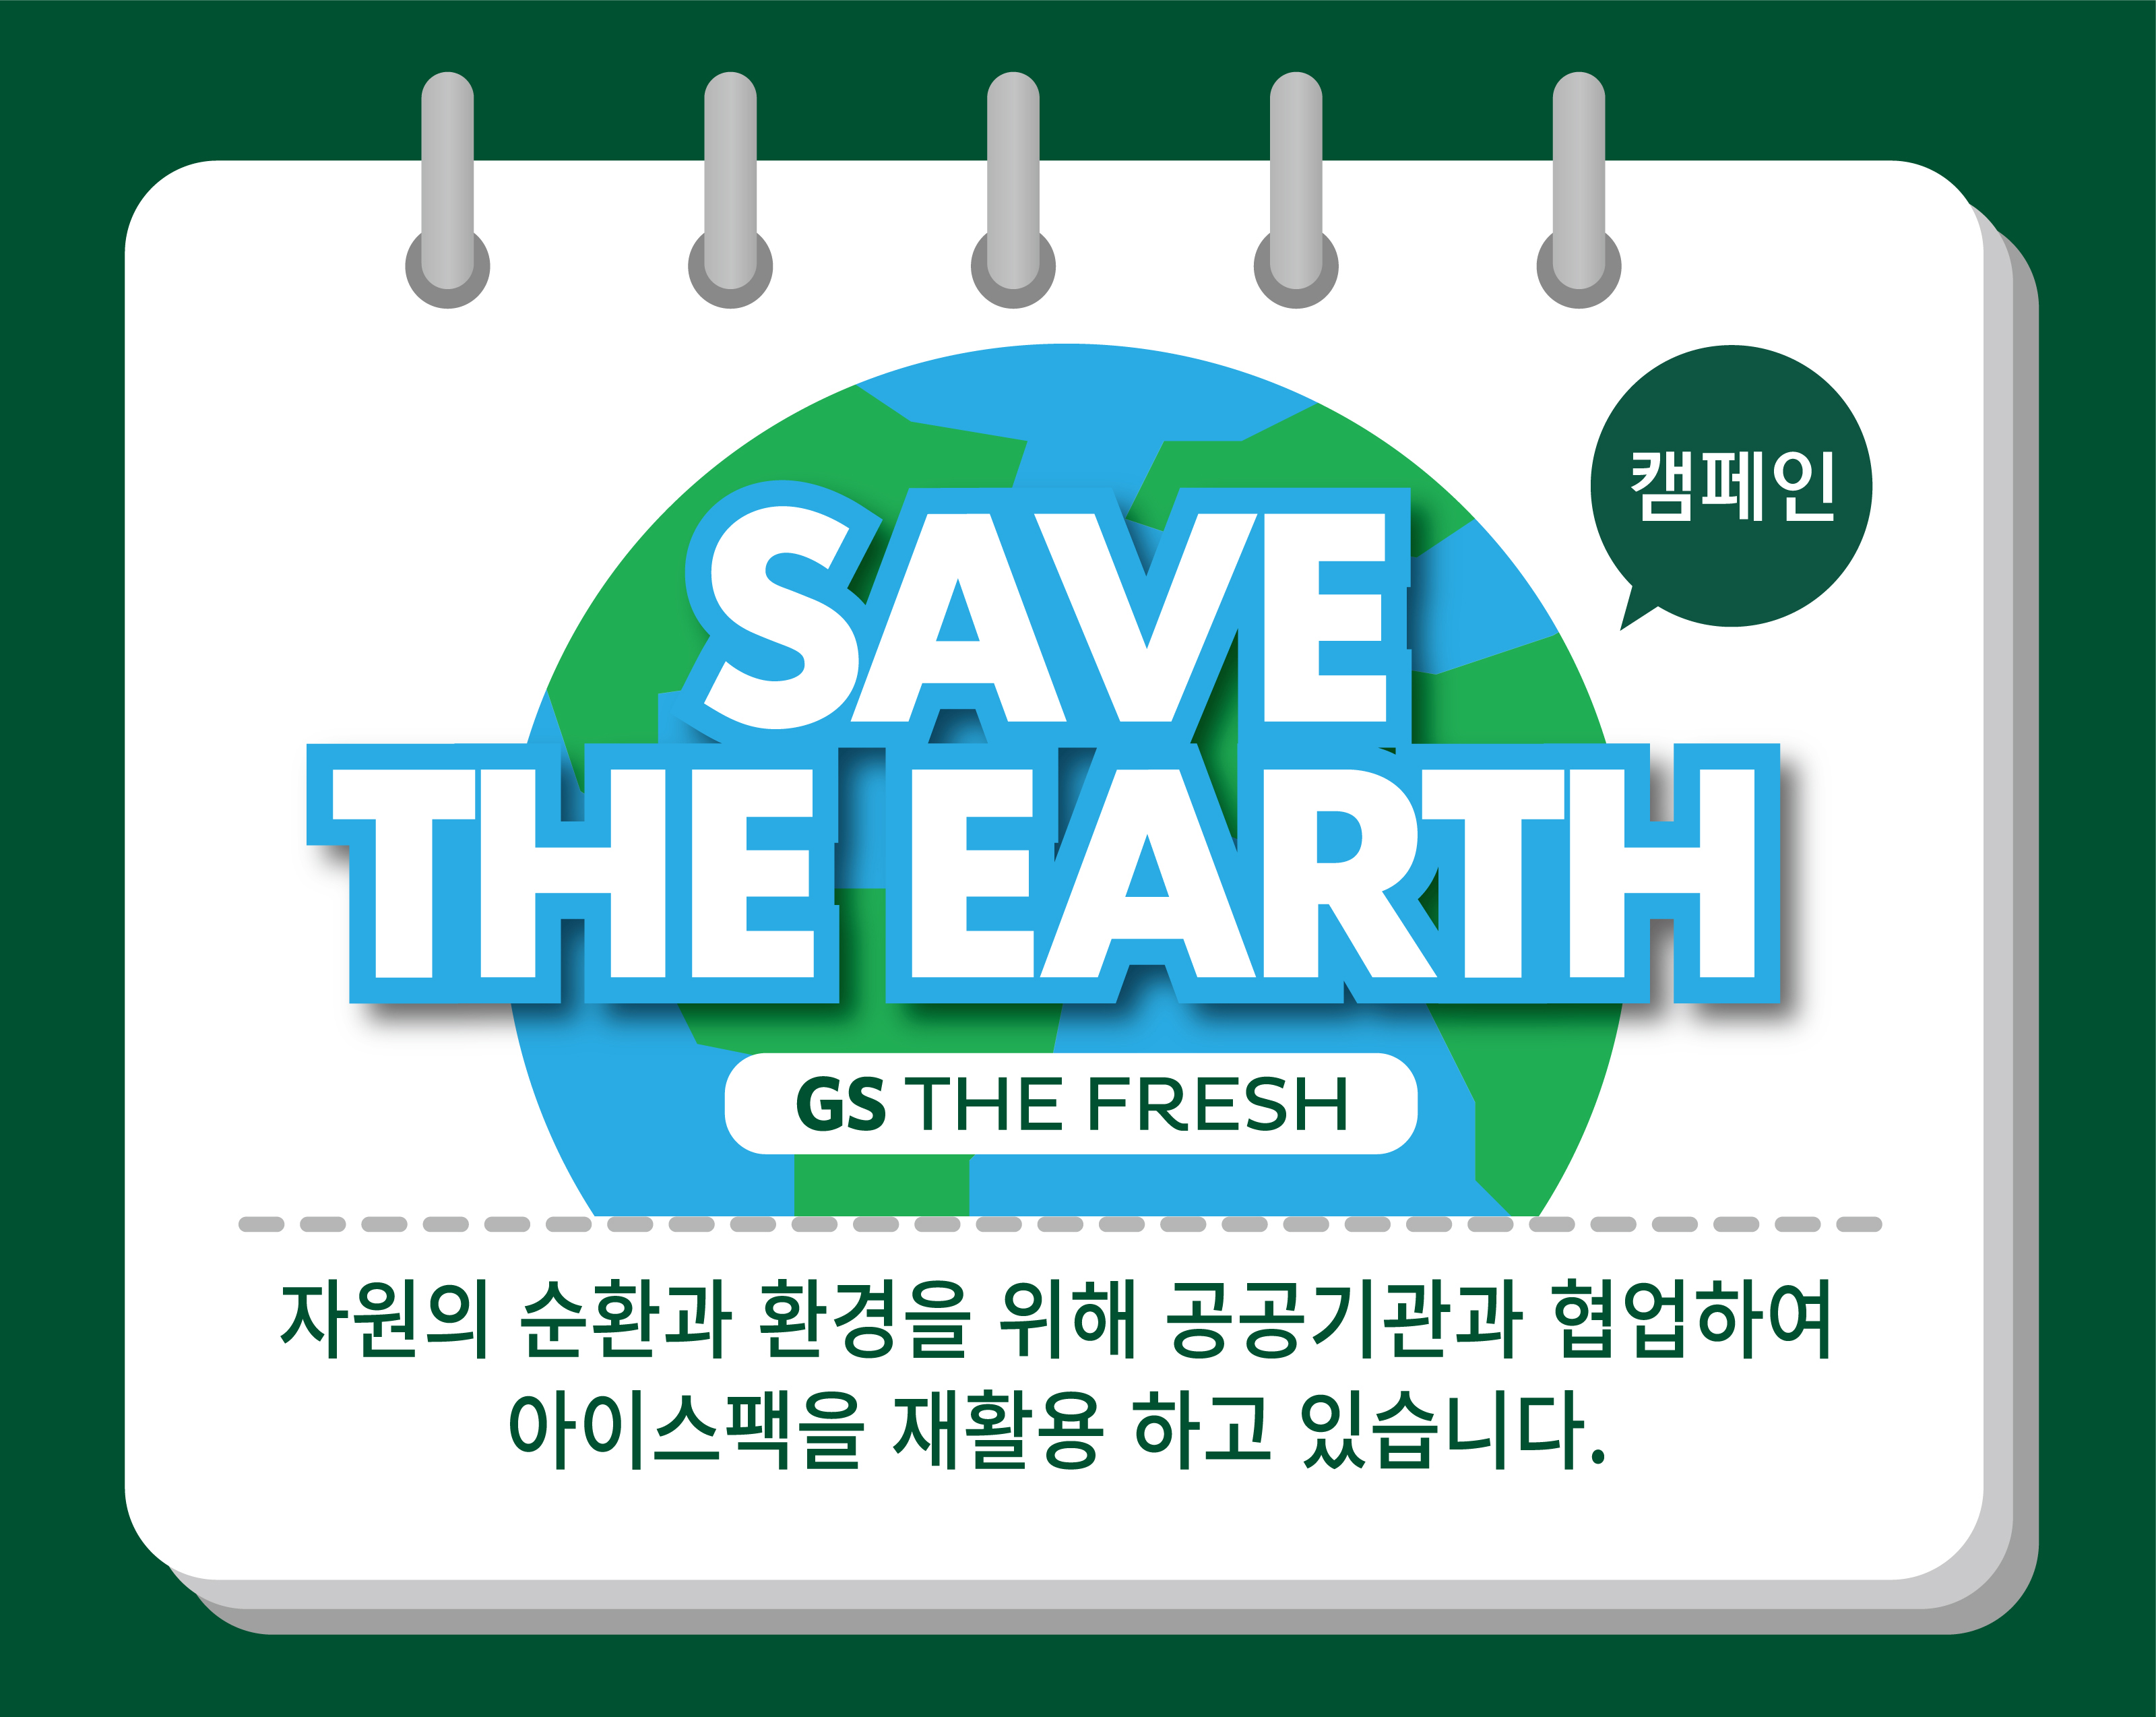 "GS수퍼마켓, 지자체와 함께 ""아이스팩 선순환 캠페인"" 전개"